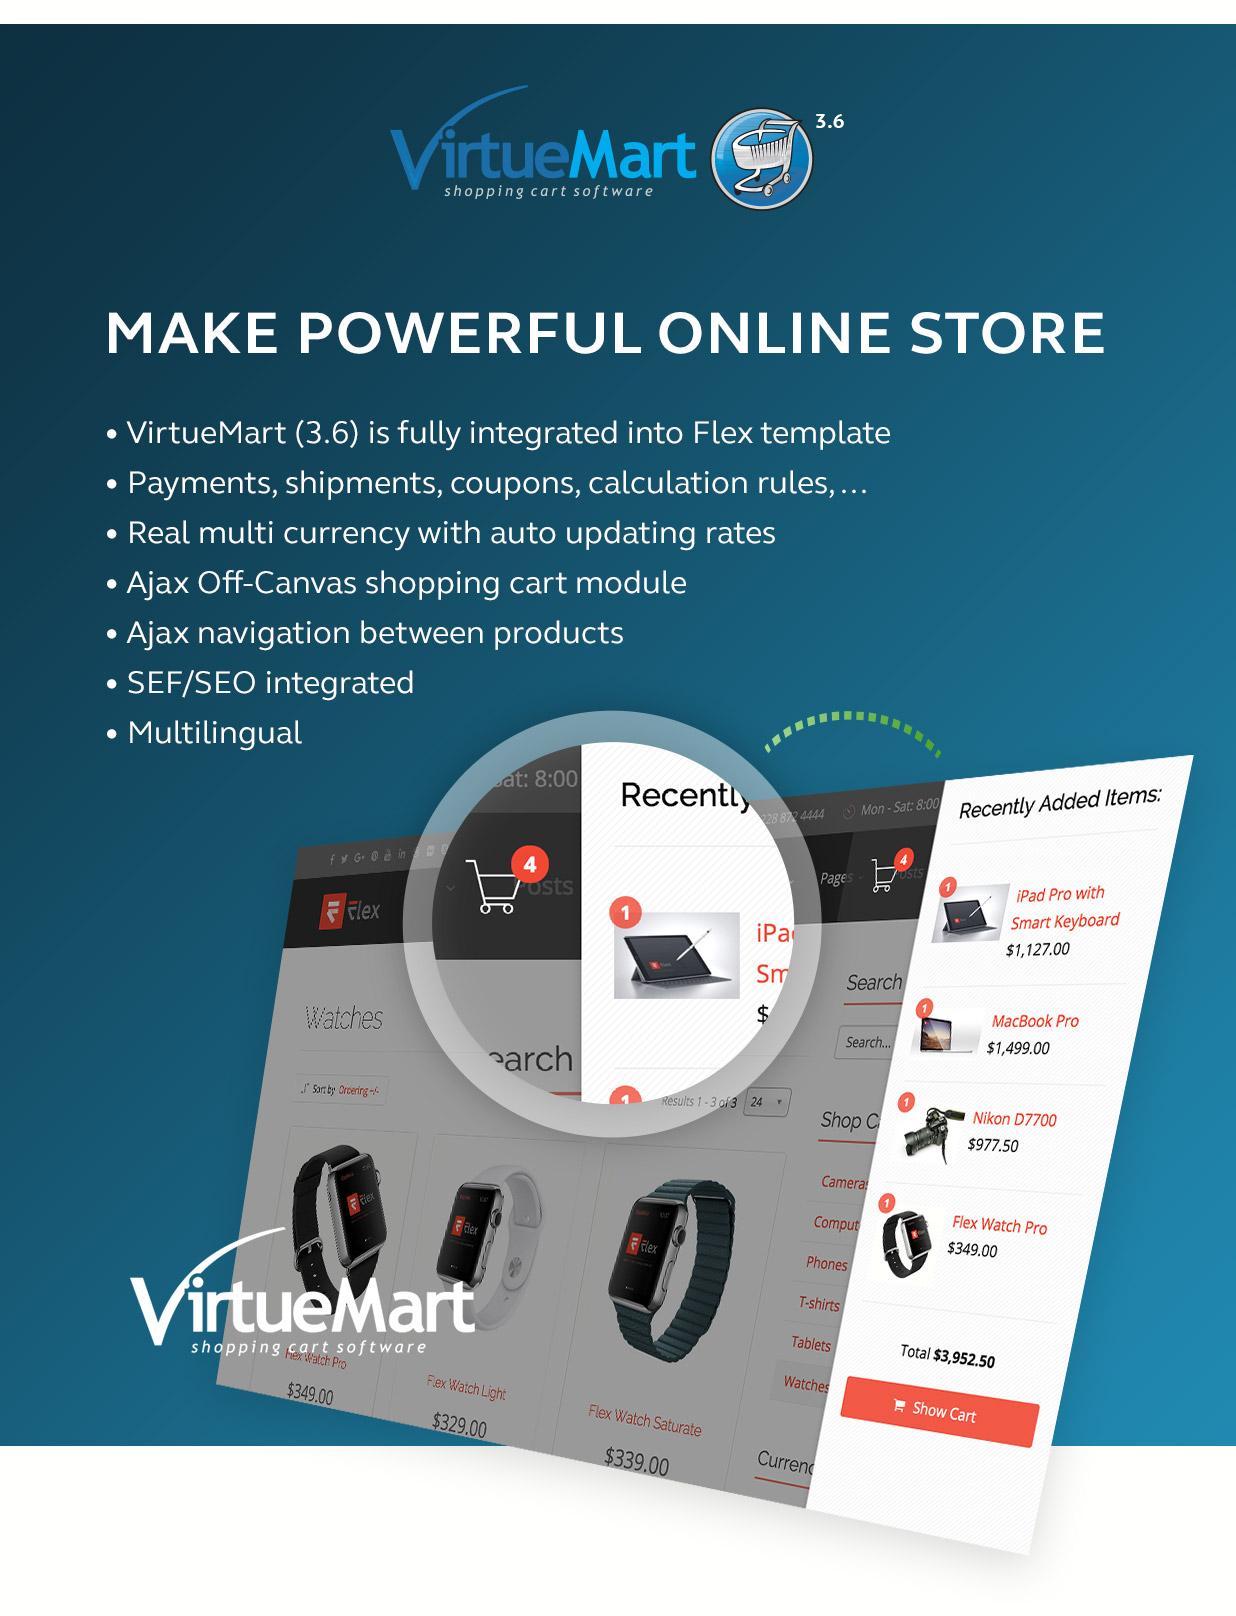 Flex - Most Flexible Joomla template with Virtuemart